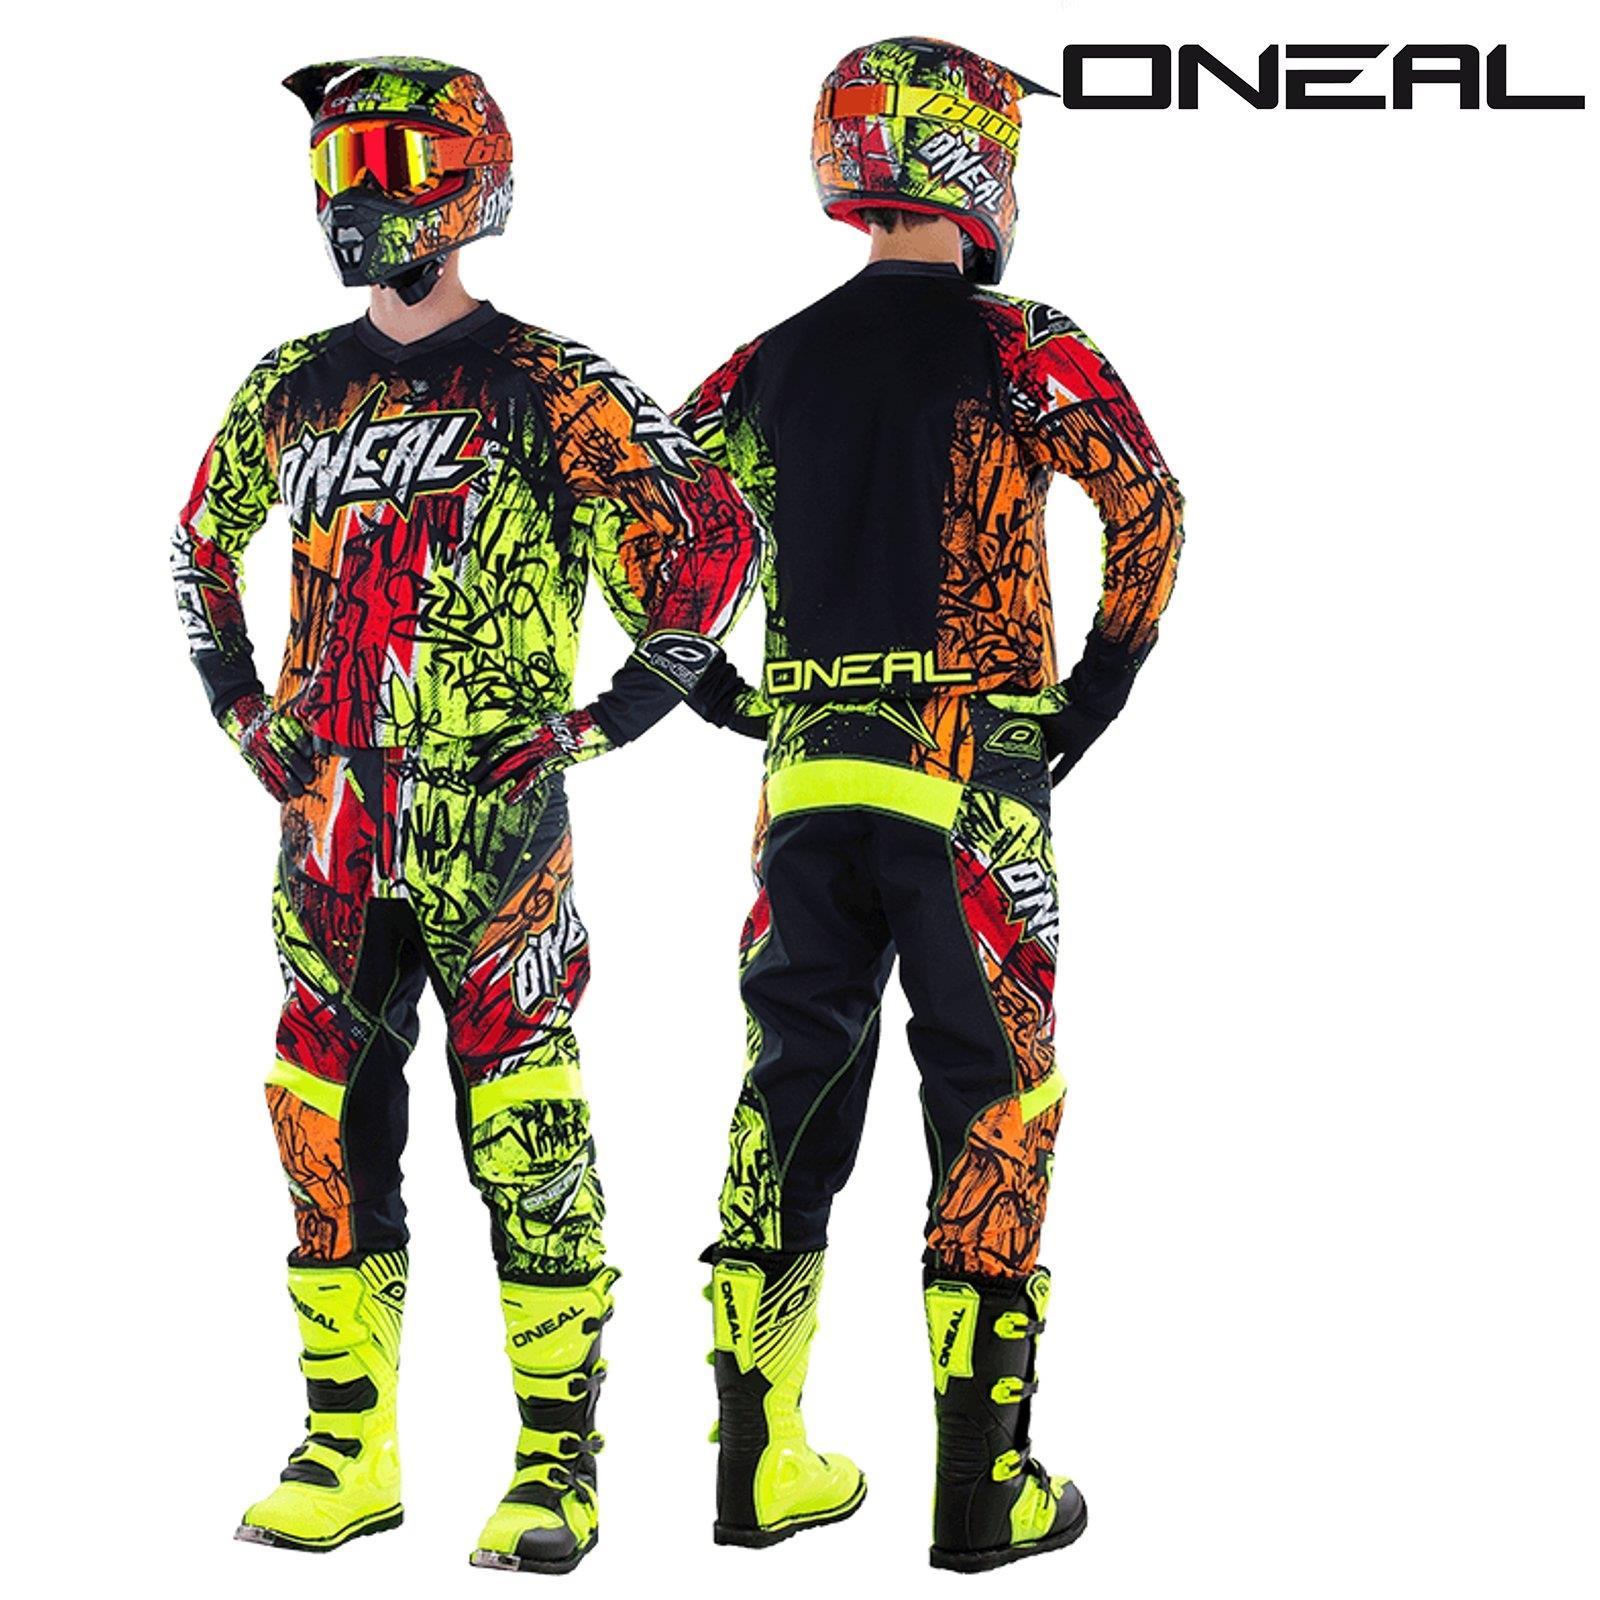 O-039-Neal-elemento-VANDAL-Combo-Jersey-Pantaloni-Motocross-MX-MTB-DH-DOWNHILL-OFFROAD miniatura 7